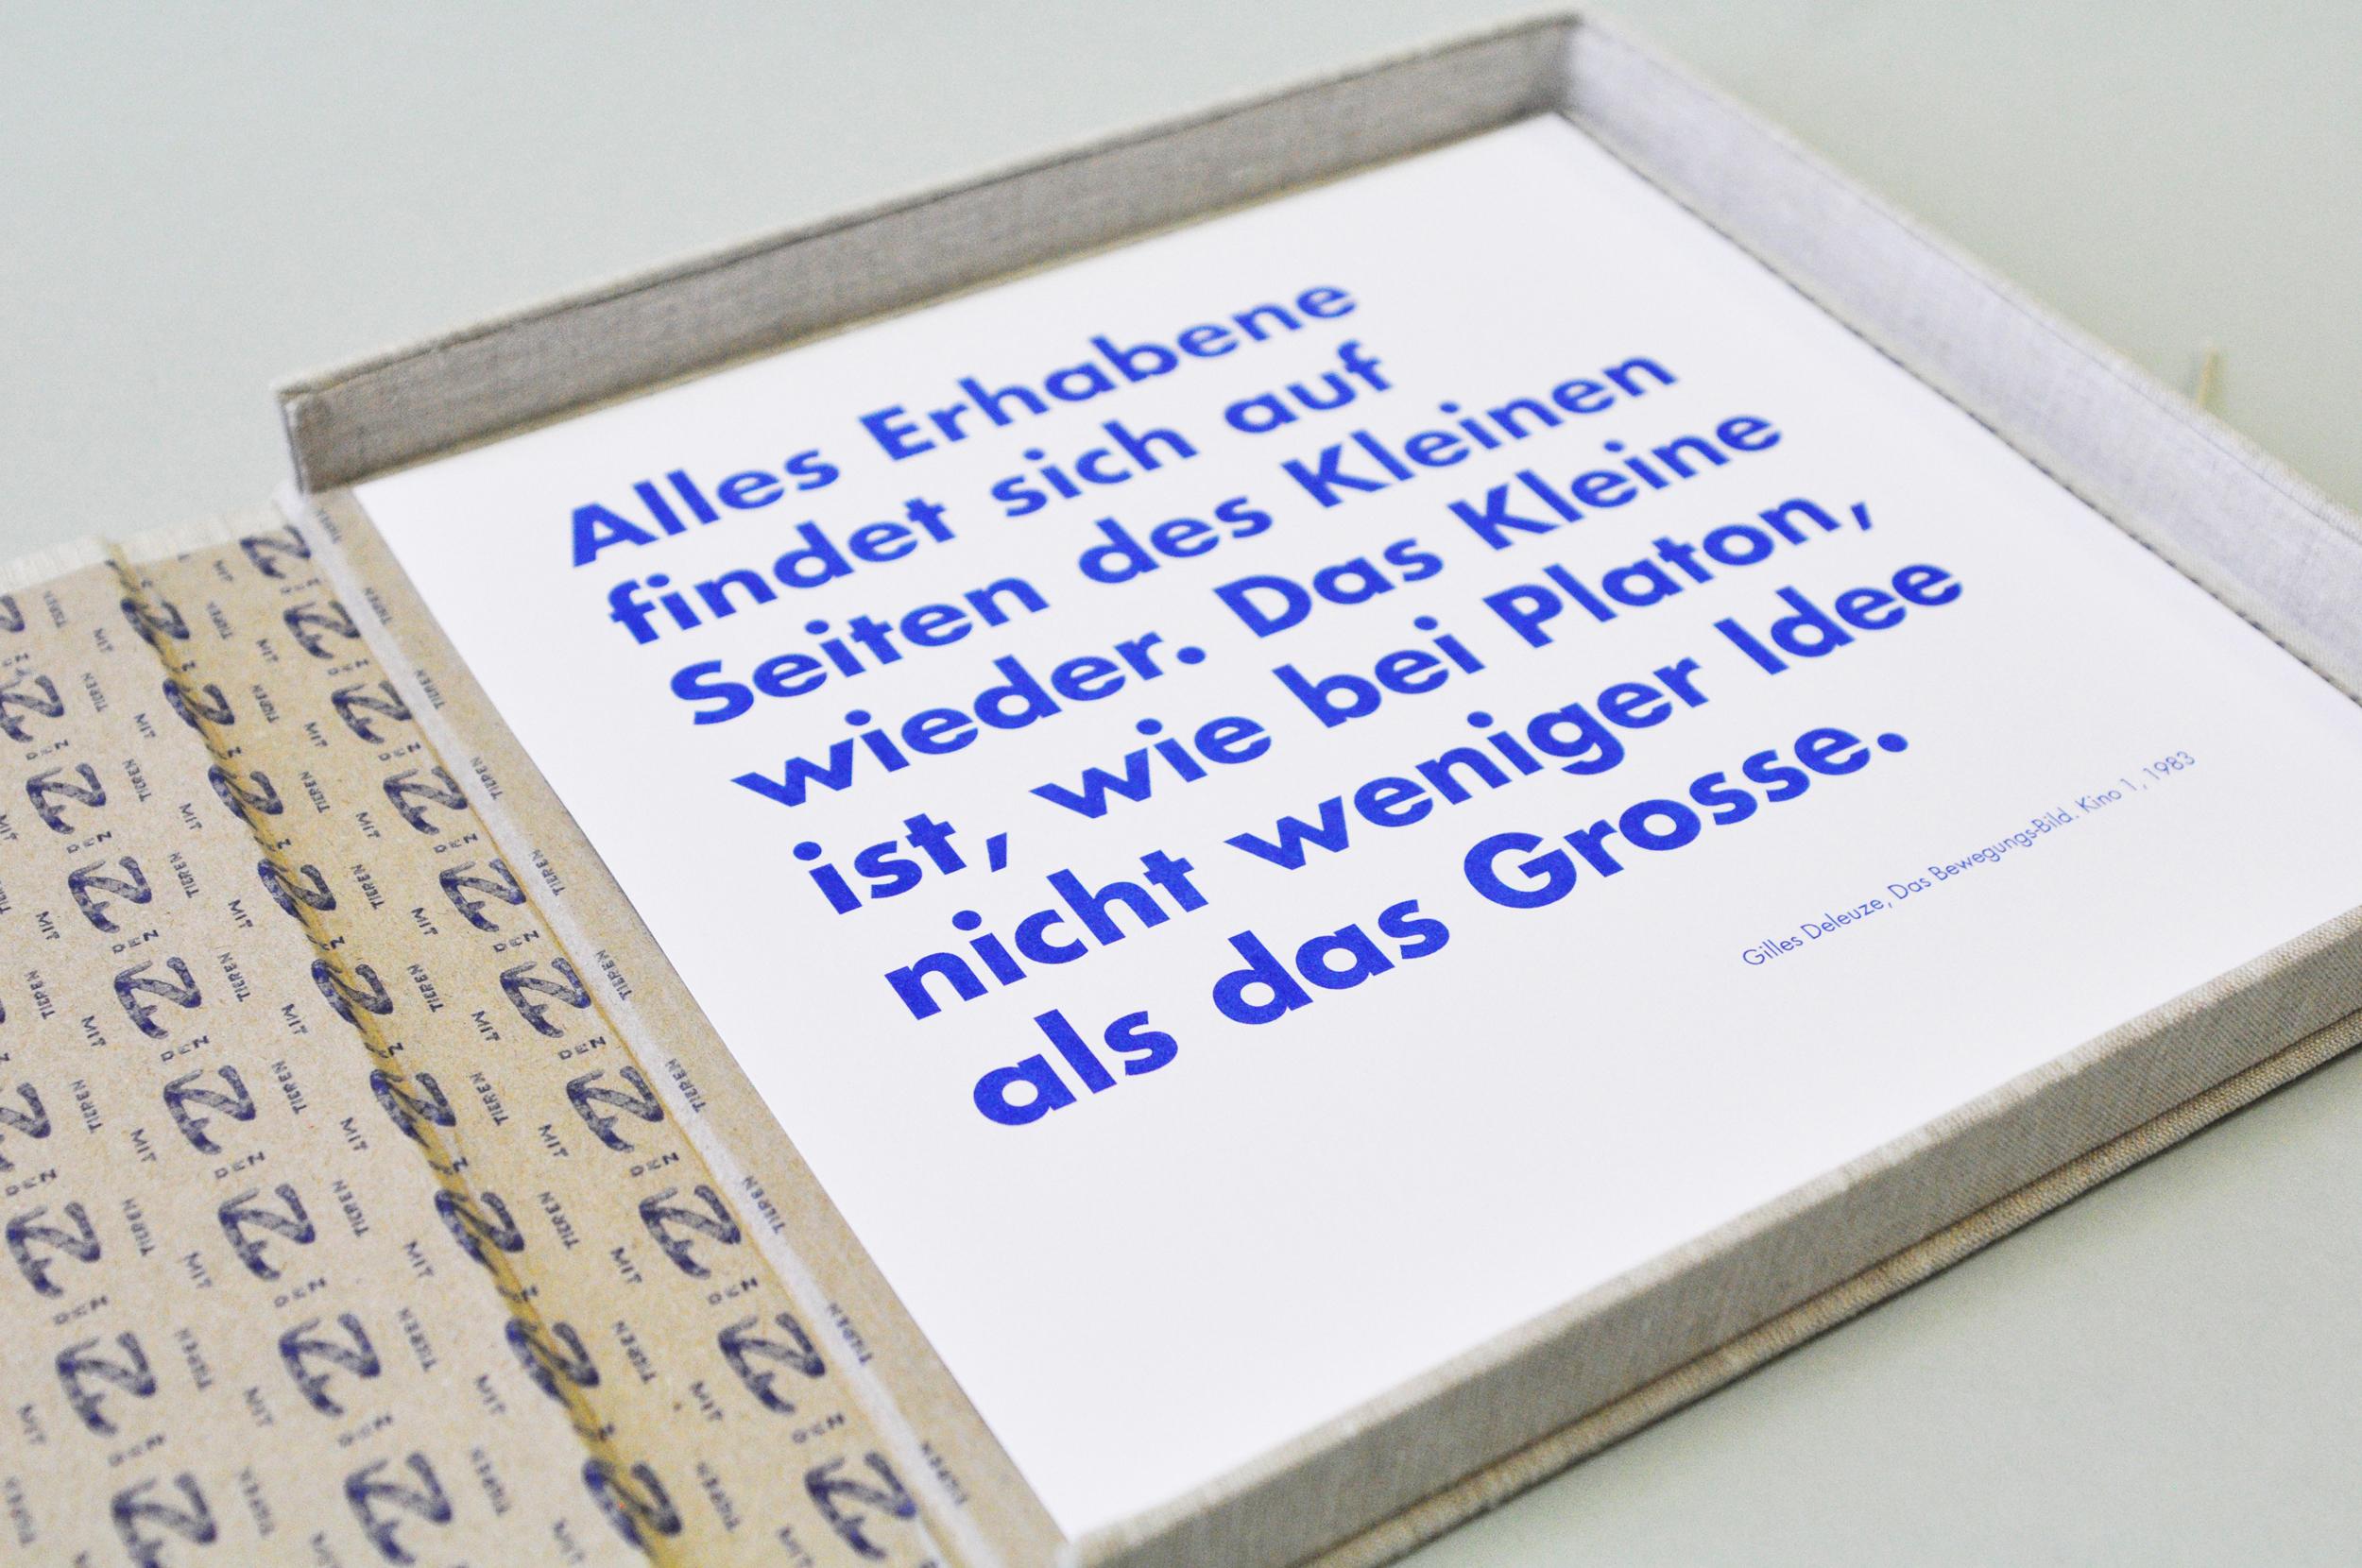 Manfred_Naescher__Edition_Ferdinand_Nigg_mit_den_Tieren_2015_-box-open-with-deleuze-quote-and-endpapers.jpg